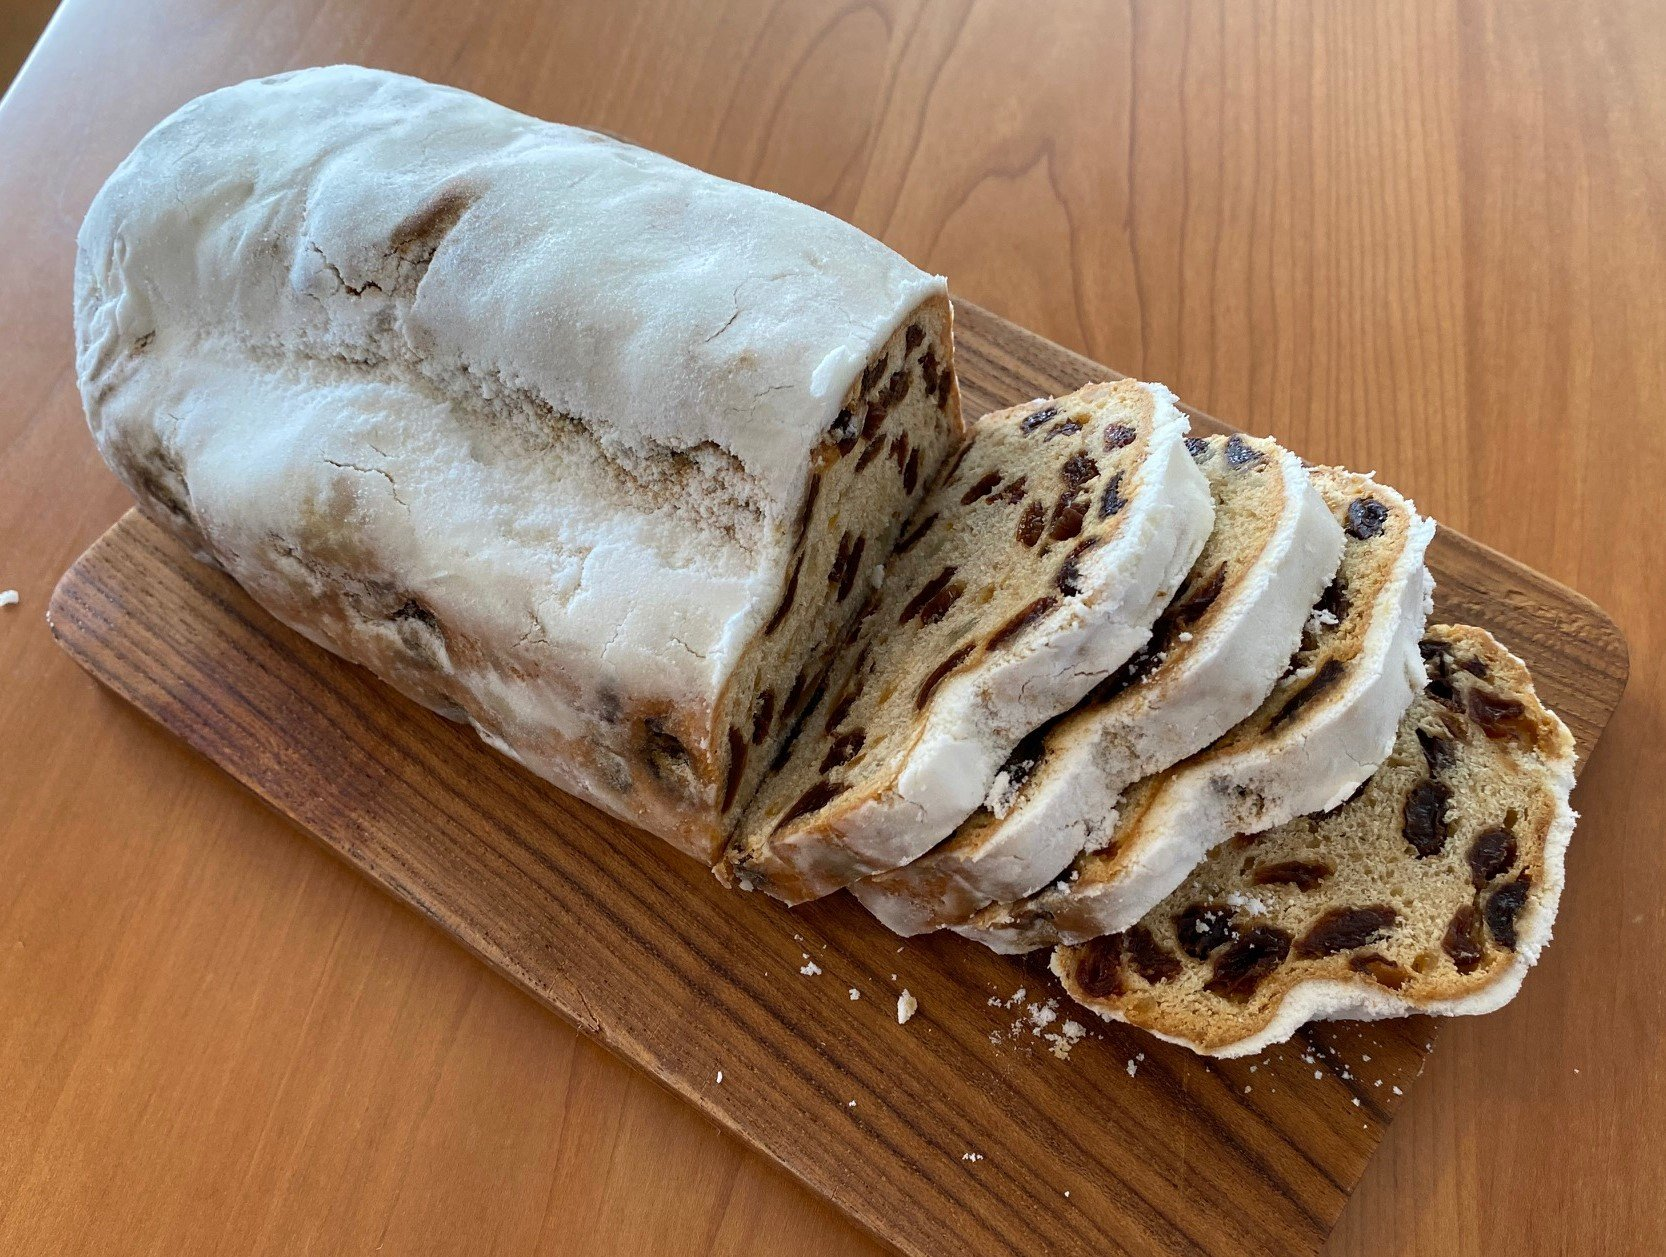 Norwegian desserts, julecake, stollen, Christmas, Nora Helmer, Henrik Ibsen